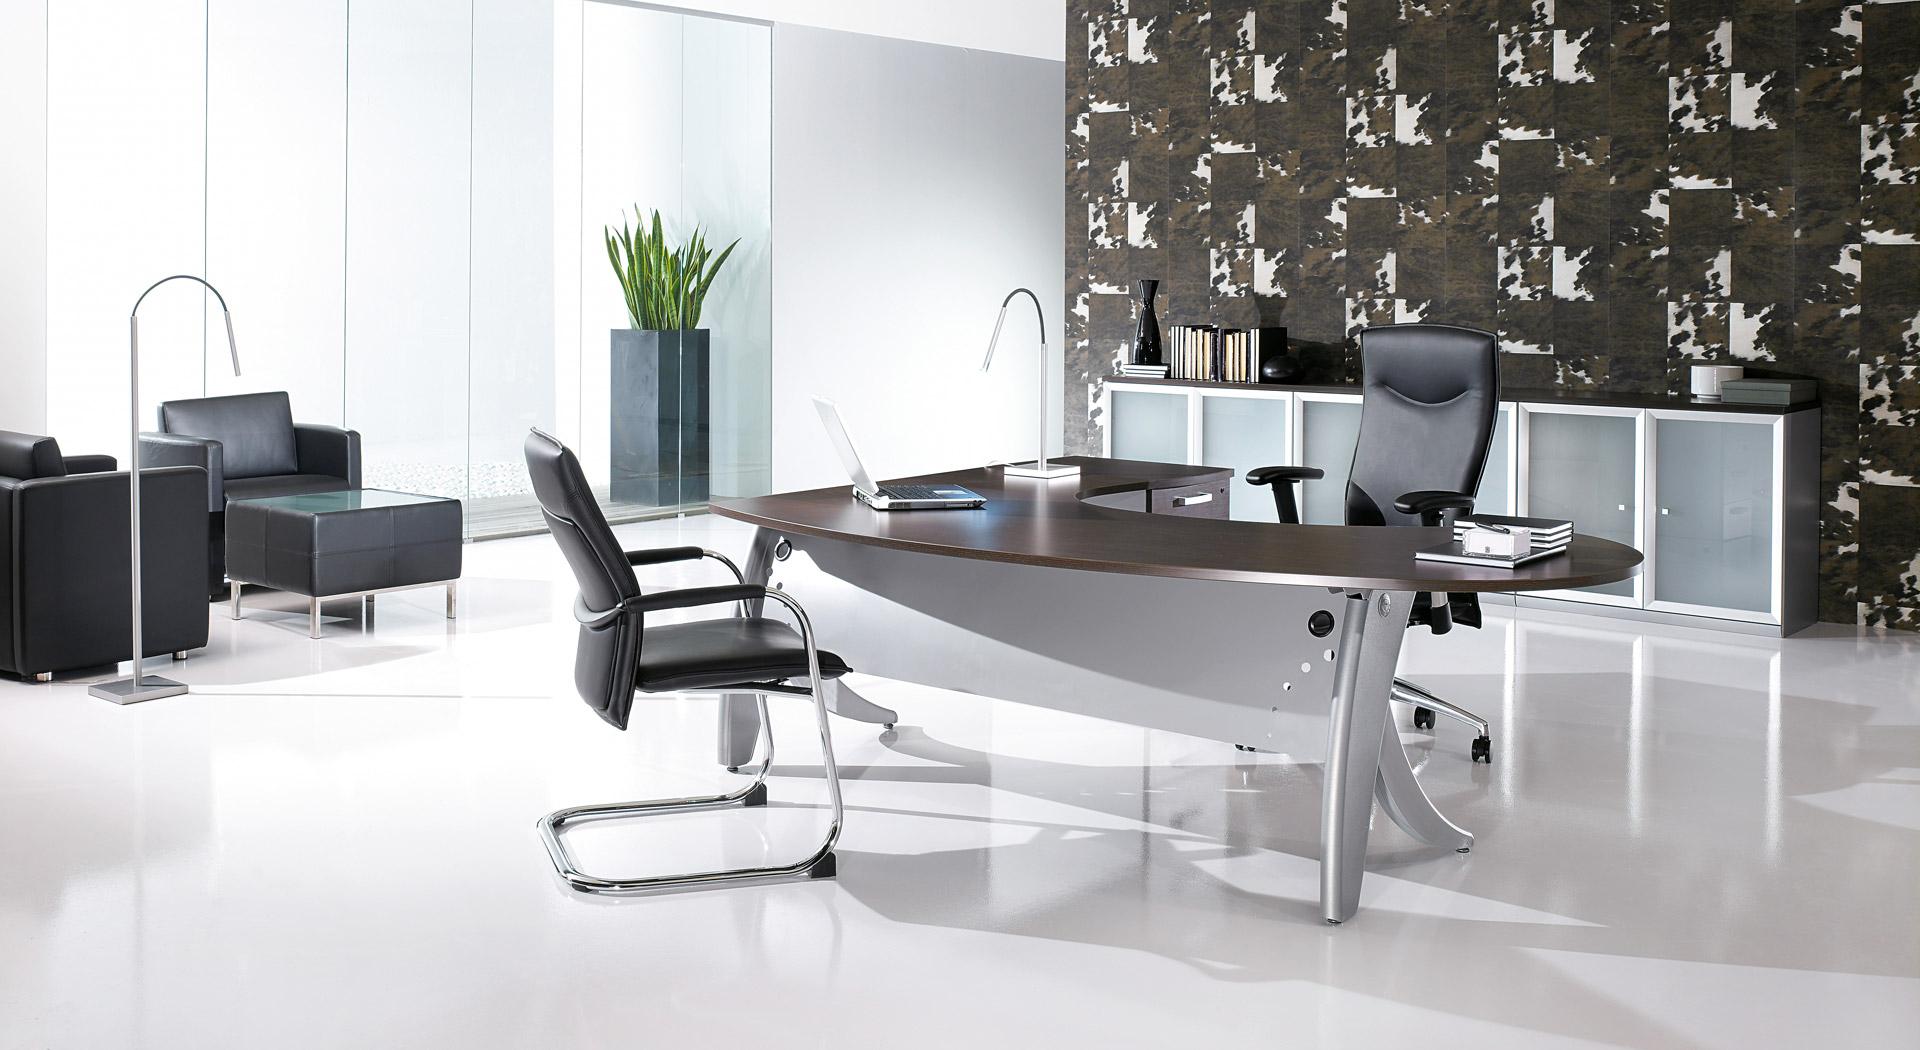 Gamme de mobilier de bureau direction Espace Bureau